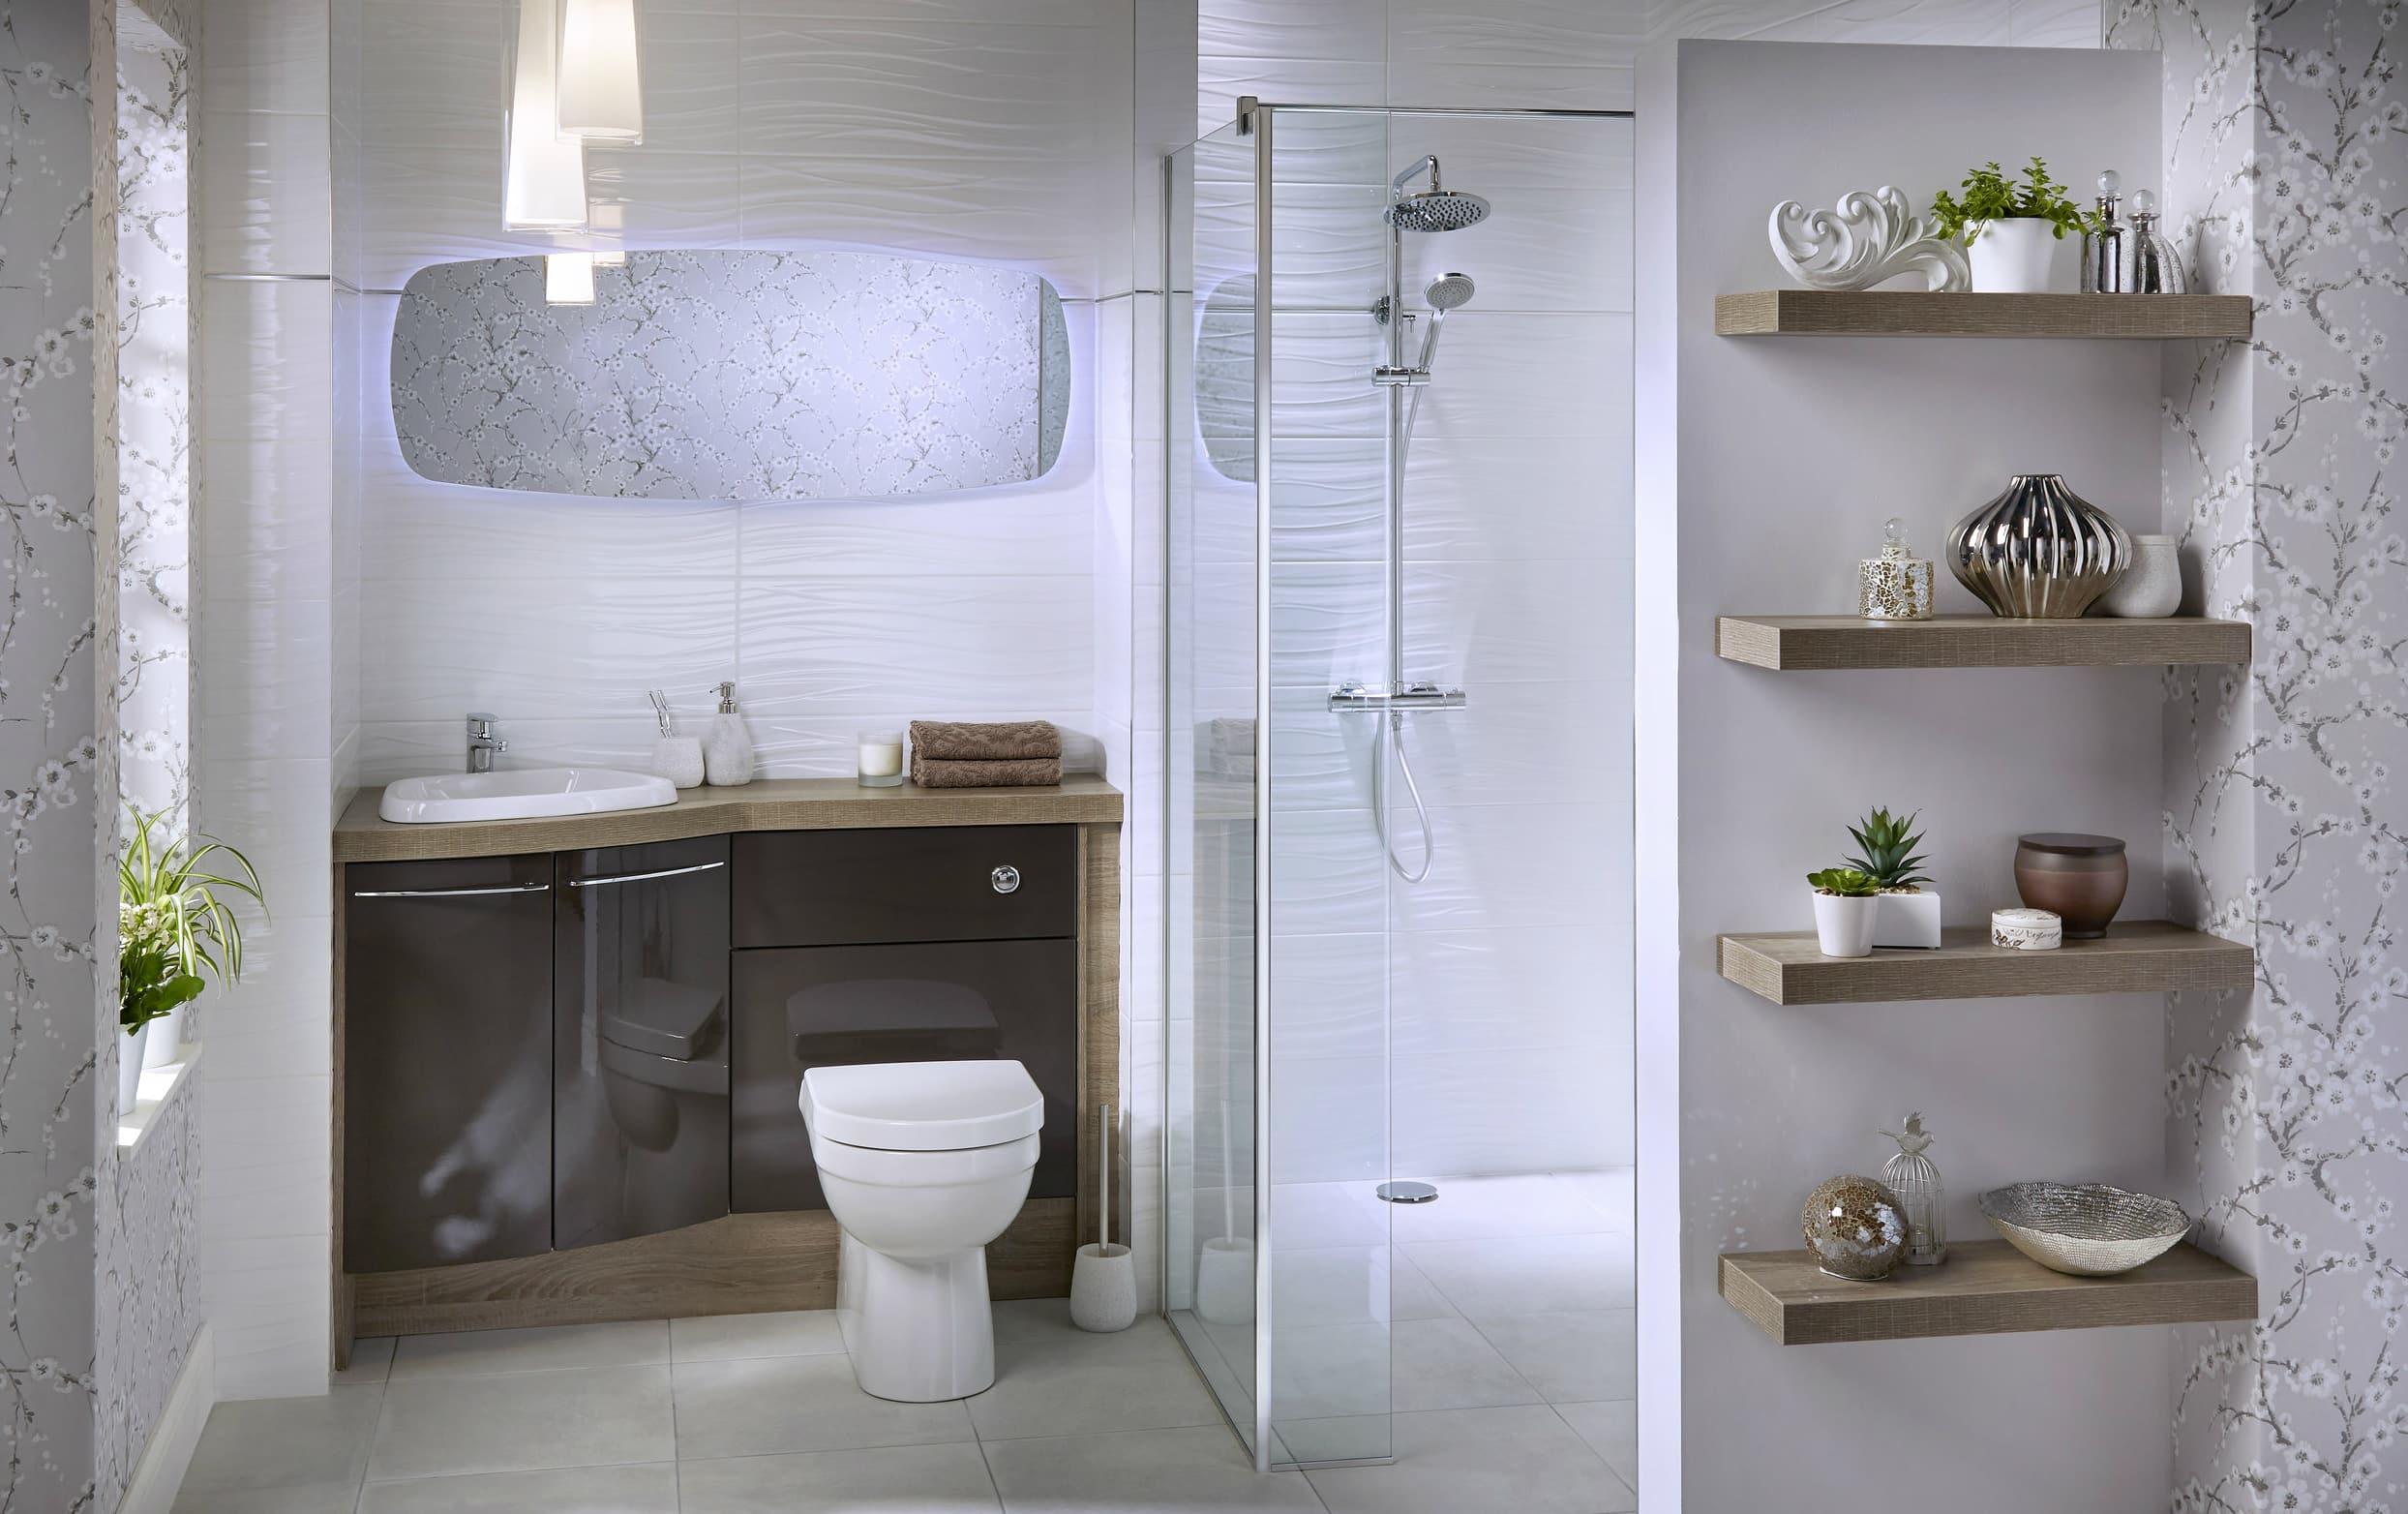 JMI Bathrooms & Fitted Kitchens Bristol  Bespoke Design